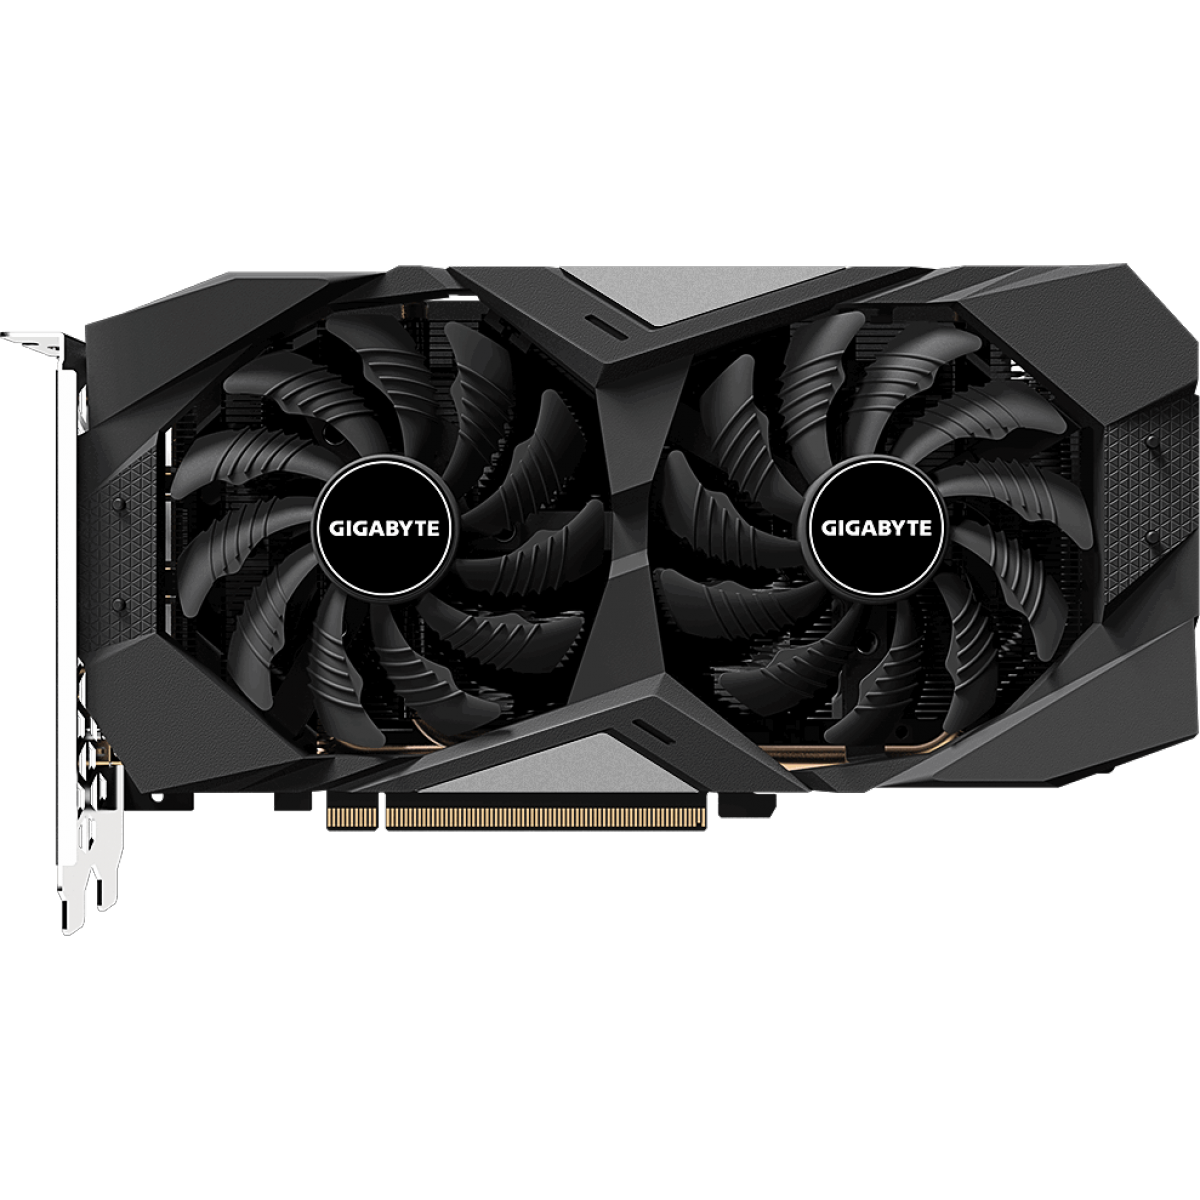 Placa de Vídeo Gigabyte Radeon RX 5500 XT OC, 8GB GDDR6, 128Bit, GV-R55XTOC-8GD